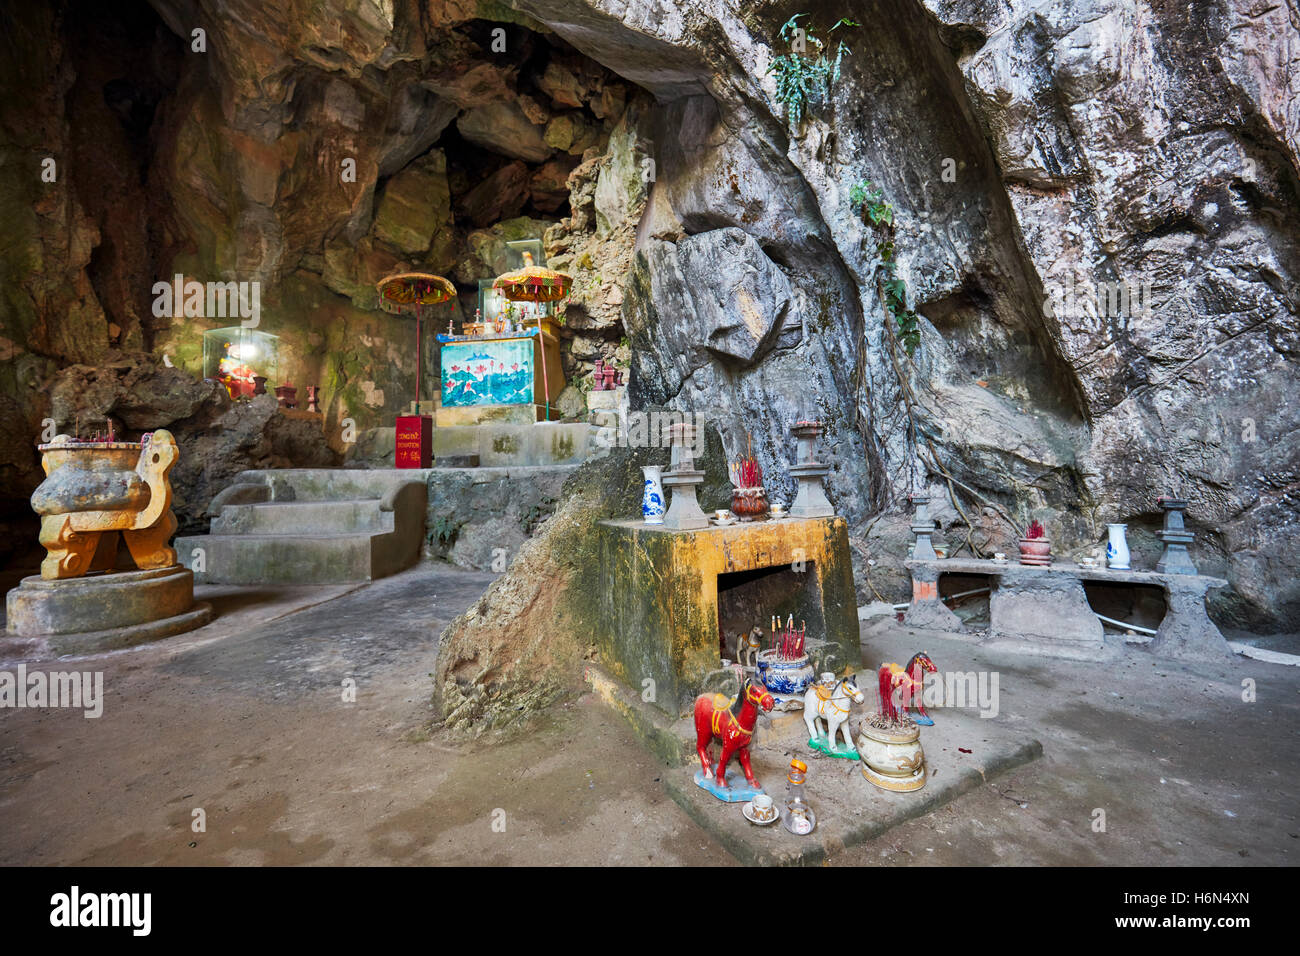 Linh Nham Cave. Thuy Son Mountain, The Marble Mountains, Da Nang, Vietnam. - Stock Image